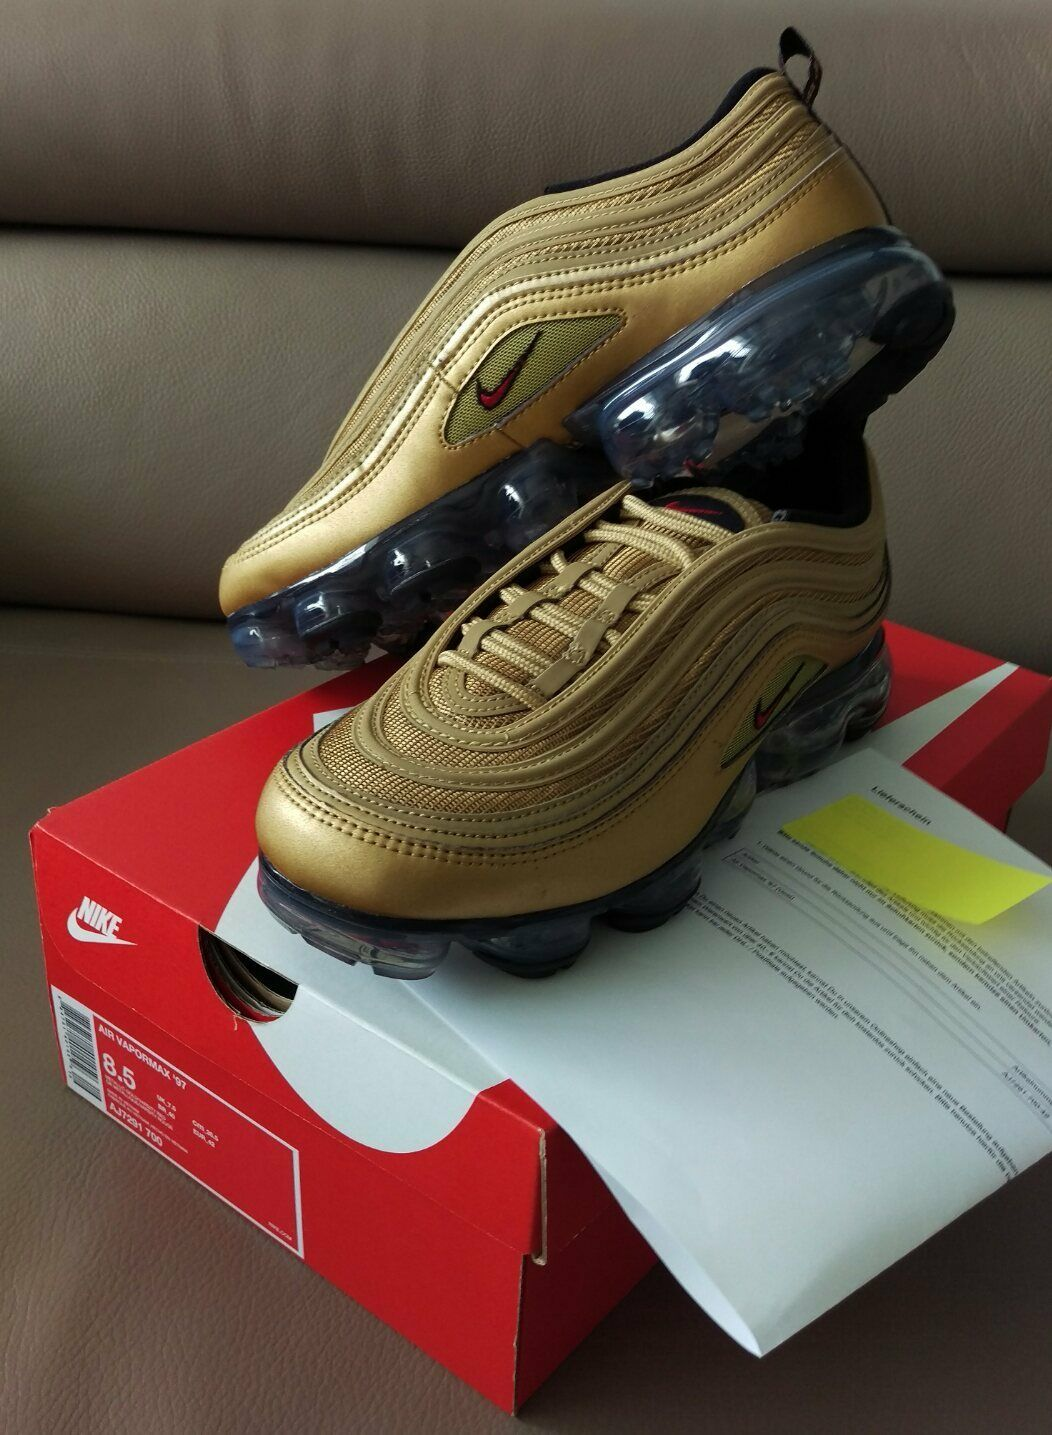 Nike Vapormax Air Max 97 Herren Schuh Sneaker OVP Edition Gold Bullet NEU OVP Sneaker Men 42 c54b35